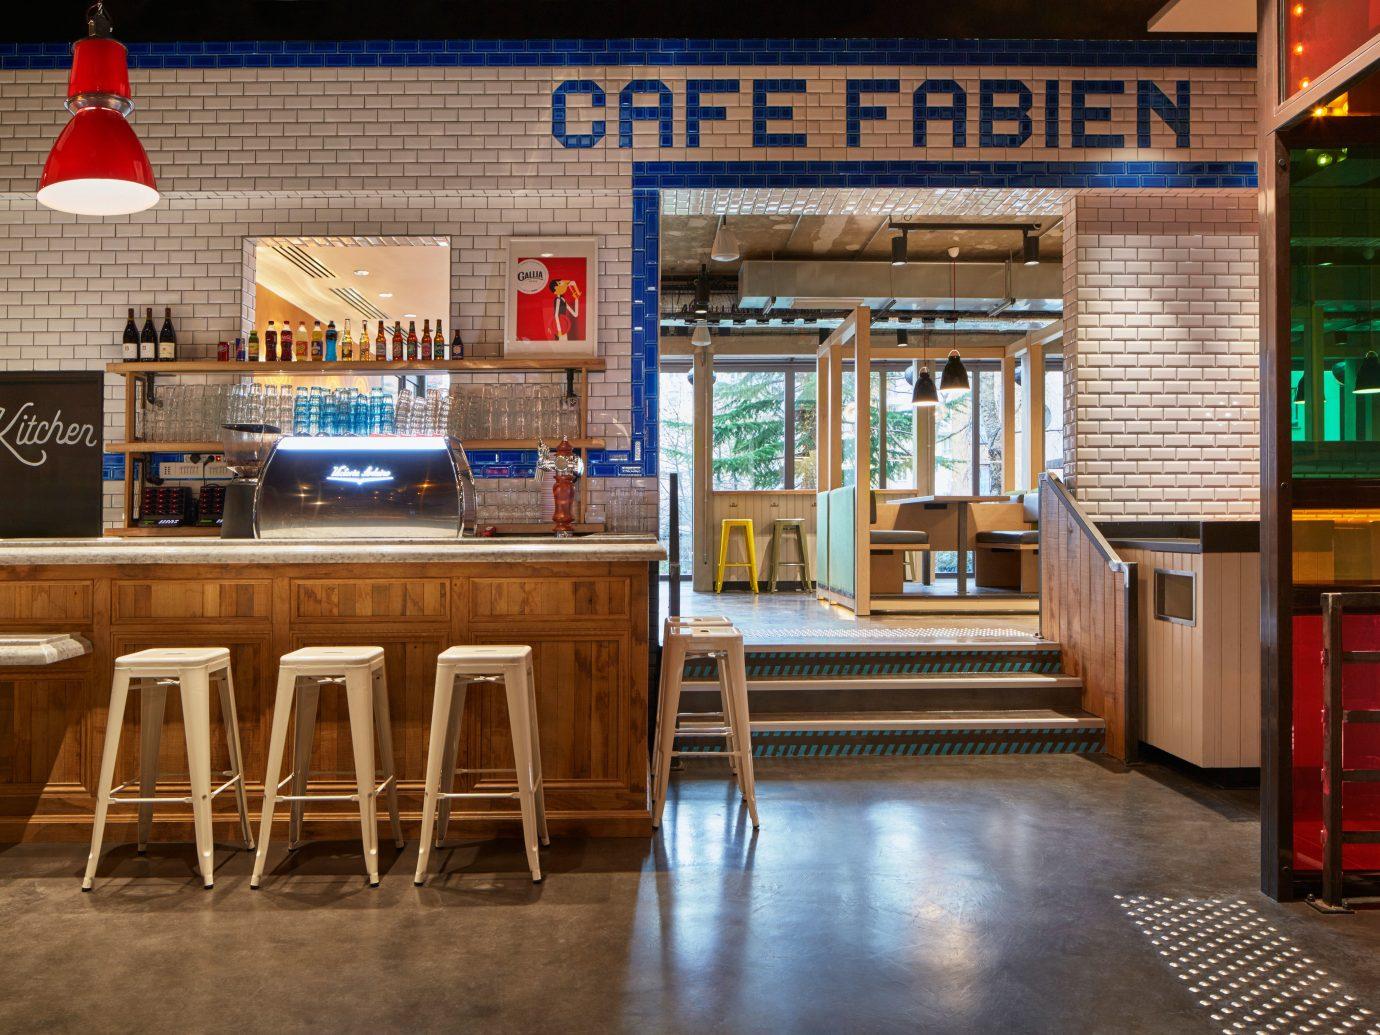 Budget City Dining Lobby Lounge floor indoor room restaurant wooden interior design Bar home window covering